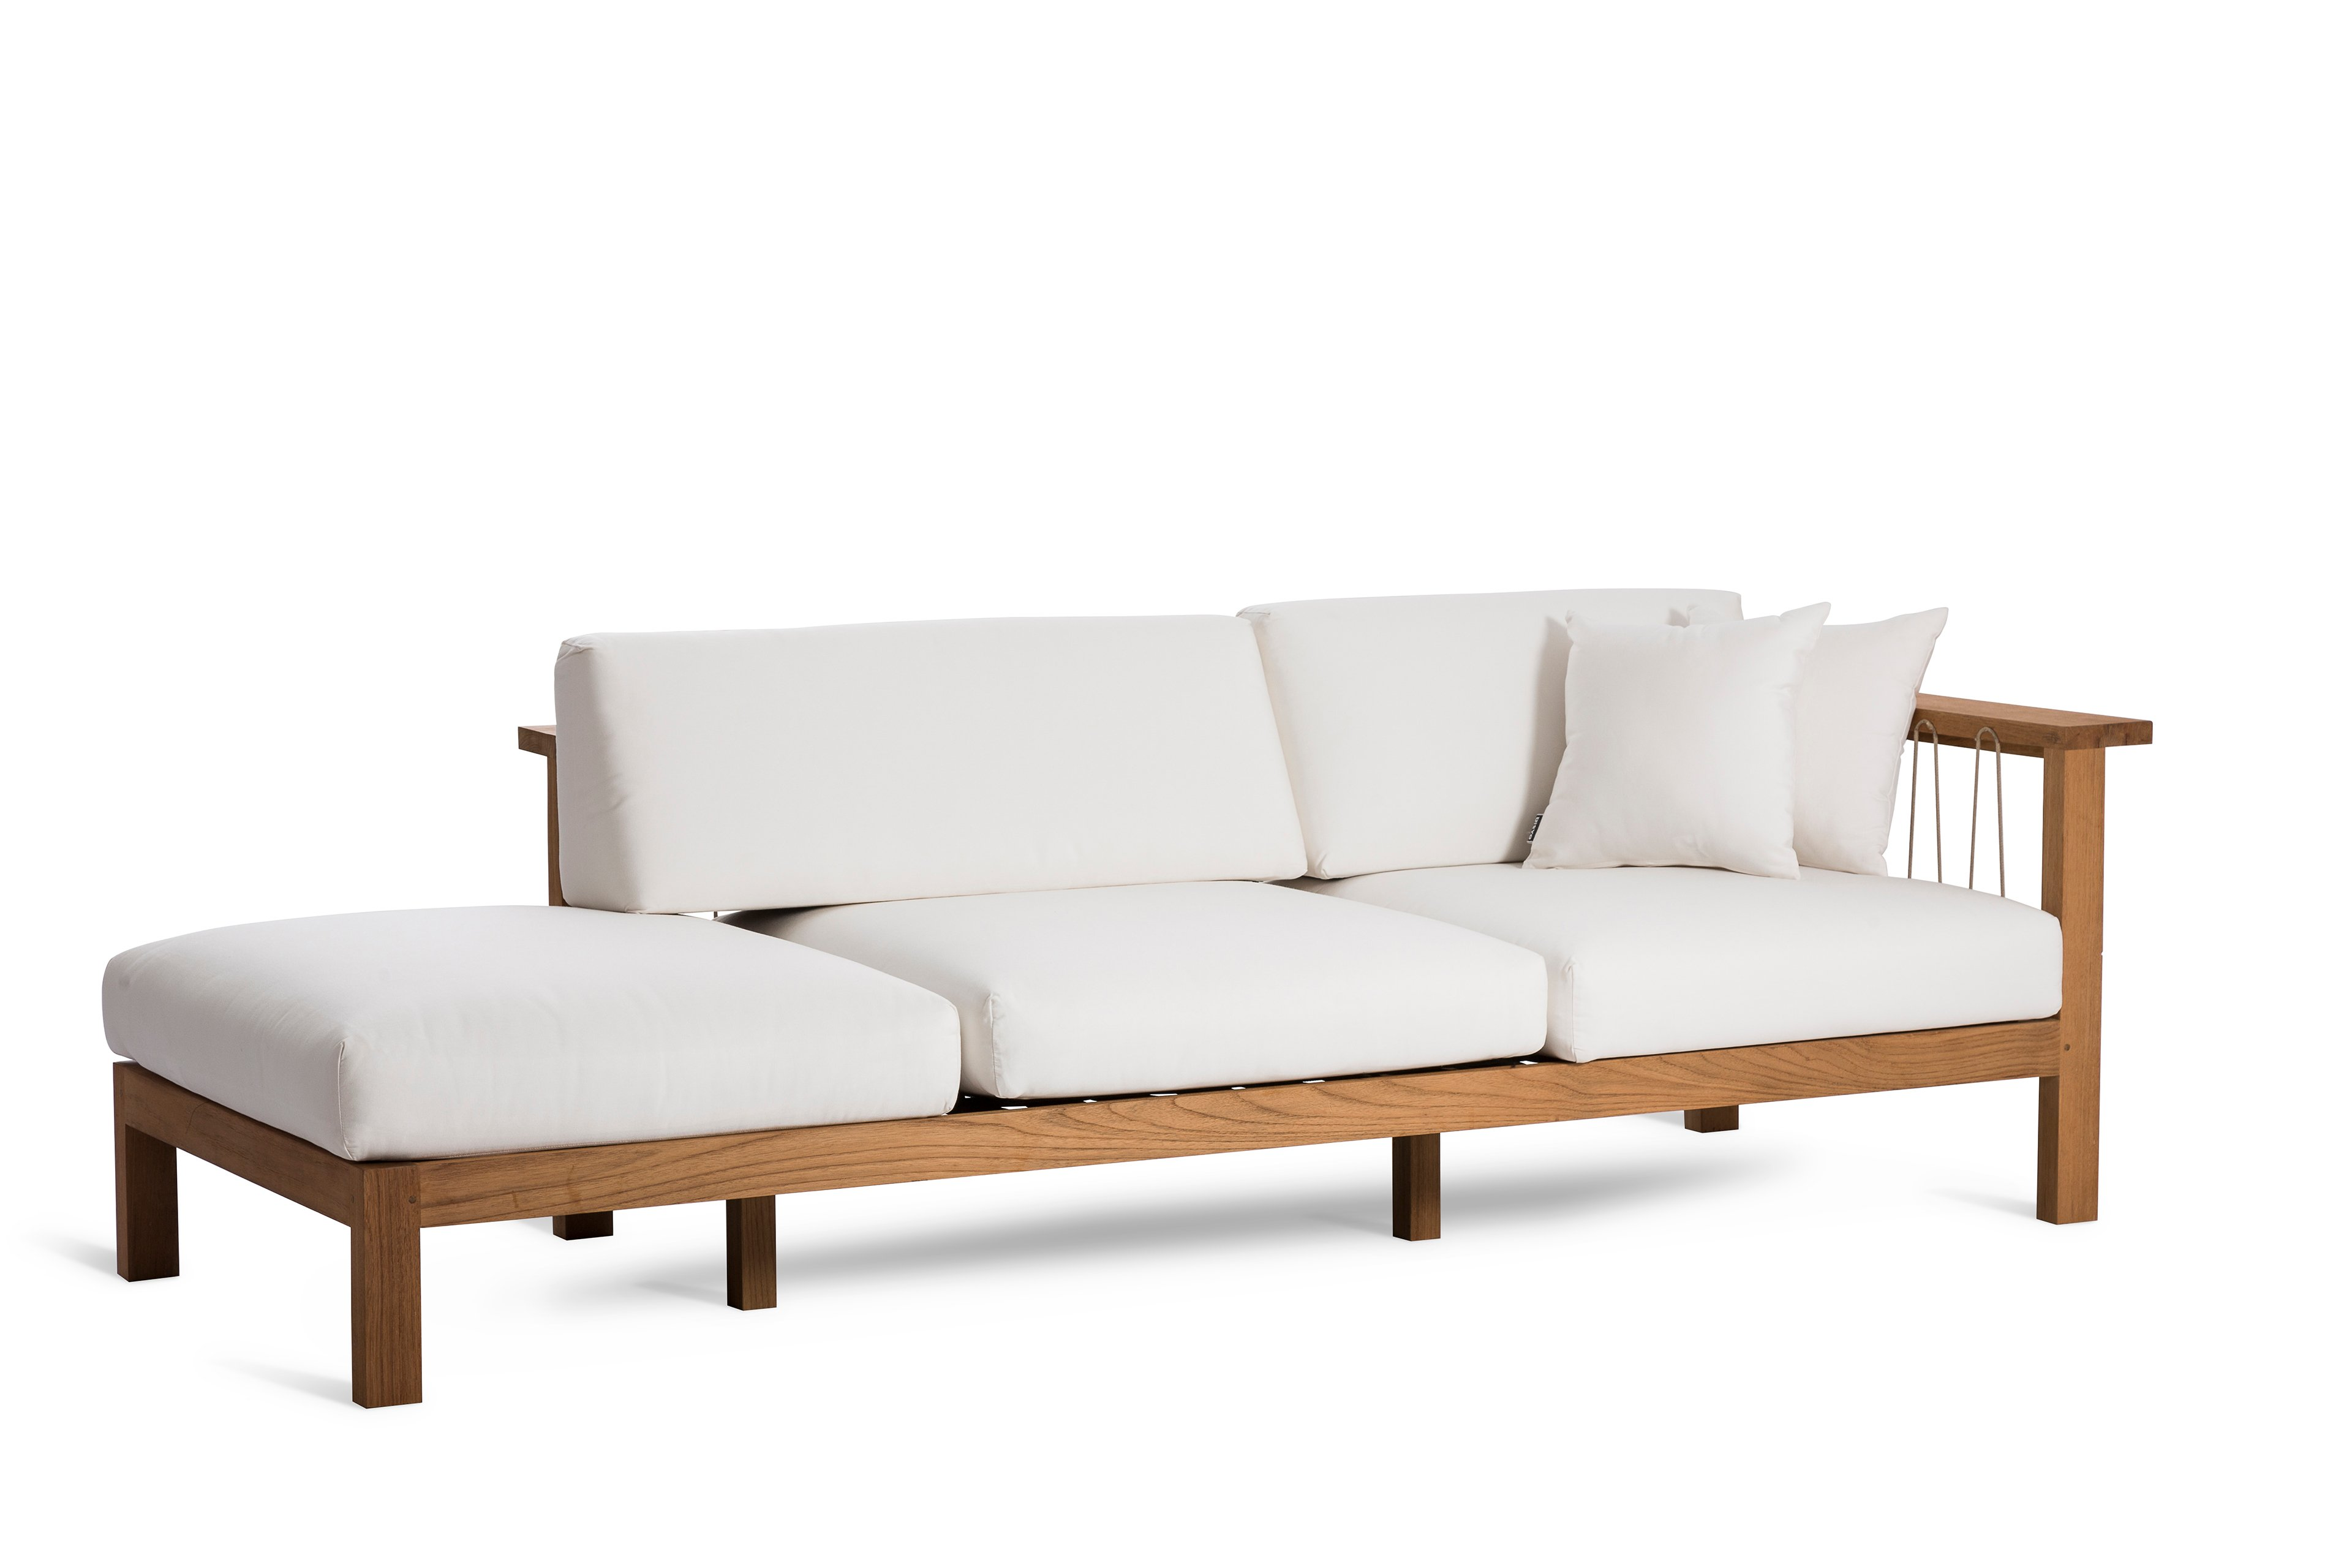 Maro sofa with chaise longue by oasiq design gijs papavoine for Chaise longue designer